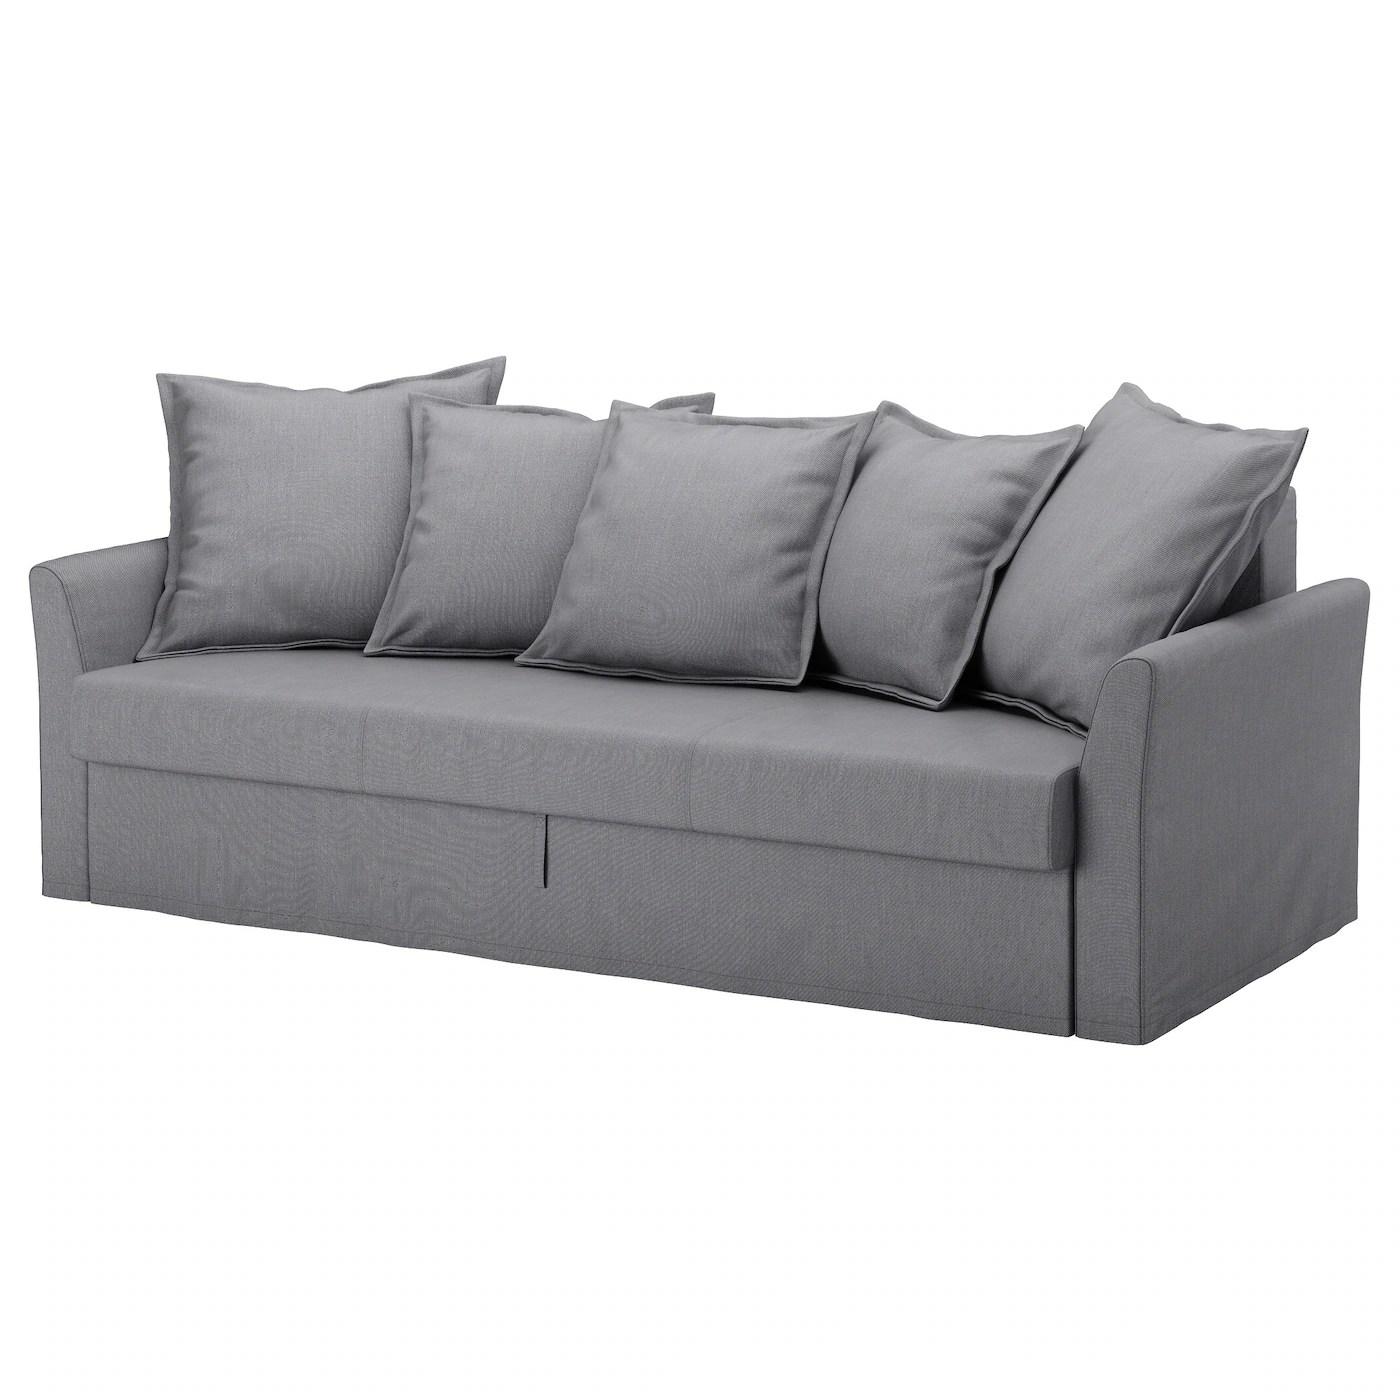 medium sofa bed sofaworks dundee opening times holmsund three seat nordvalla grey ikea